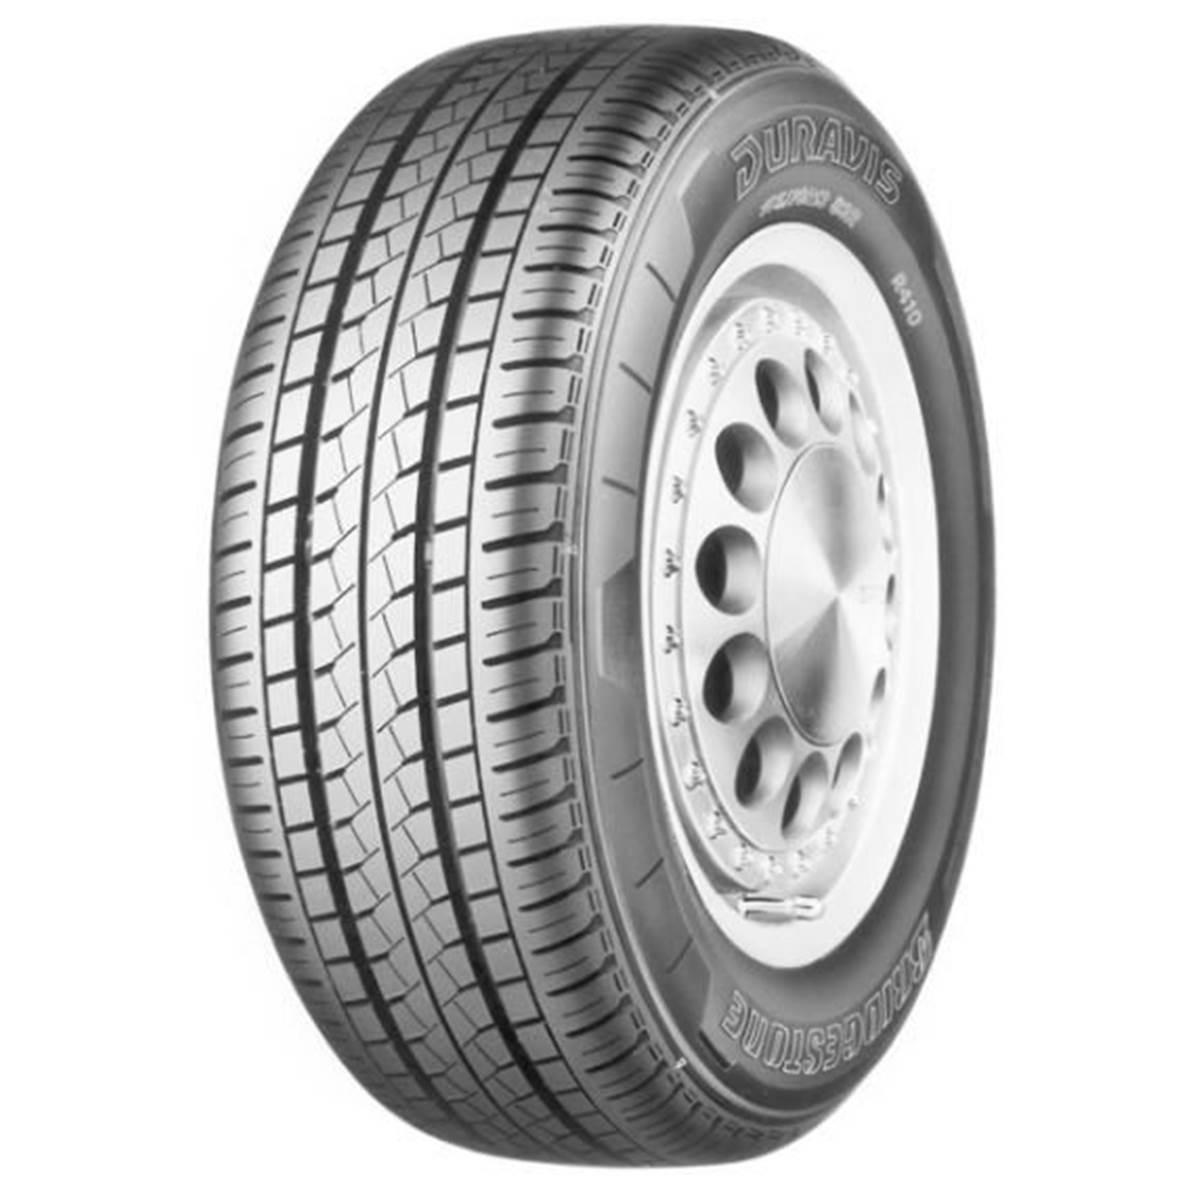 Pneu Camionnette Bridgestone 215/60R16 103T Duravis R410